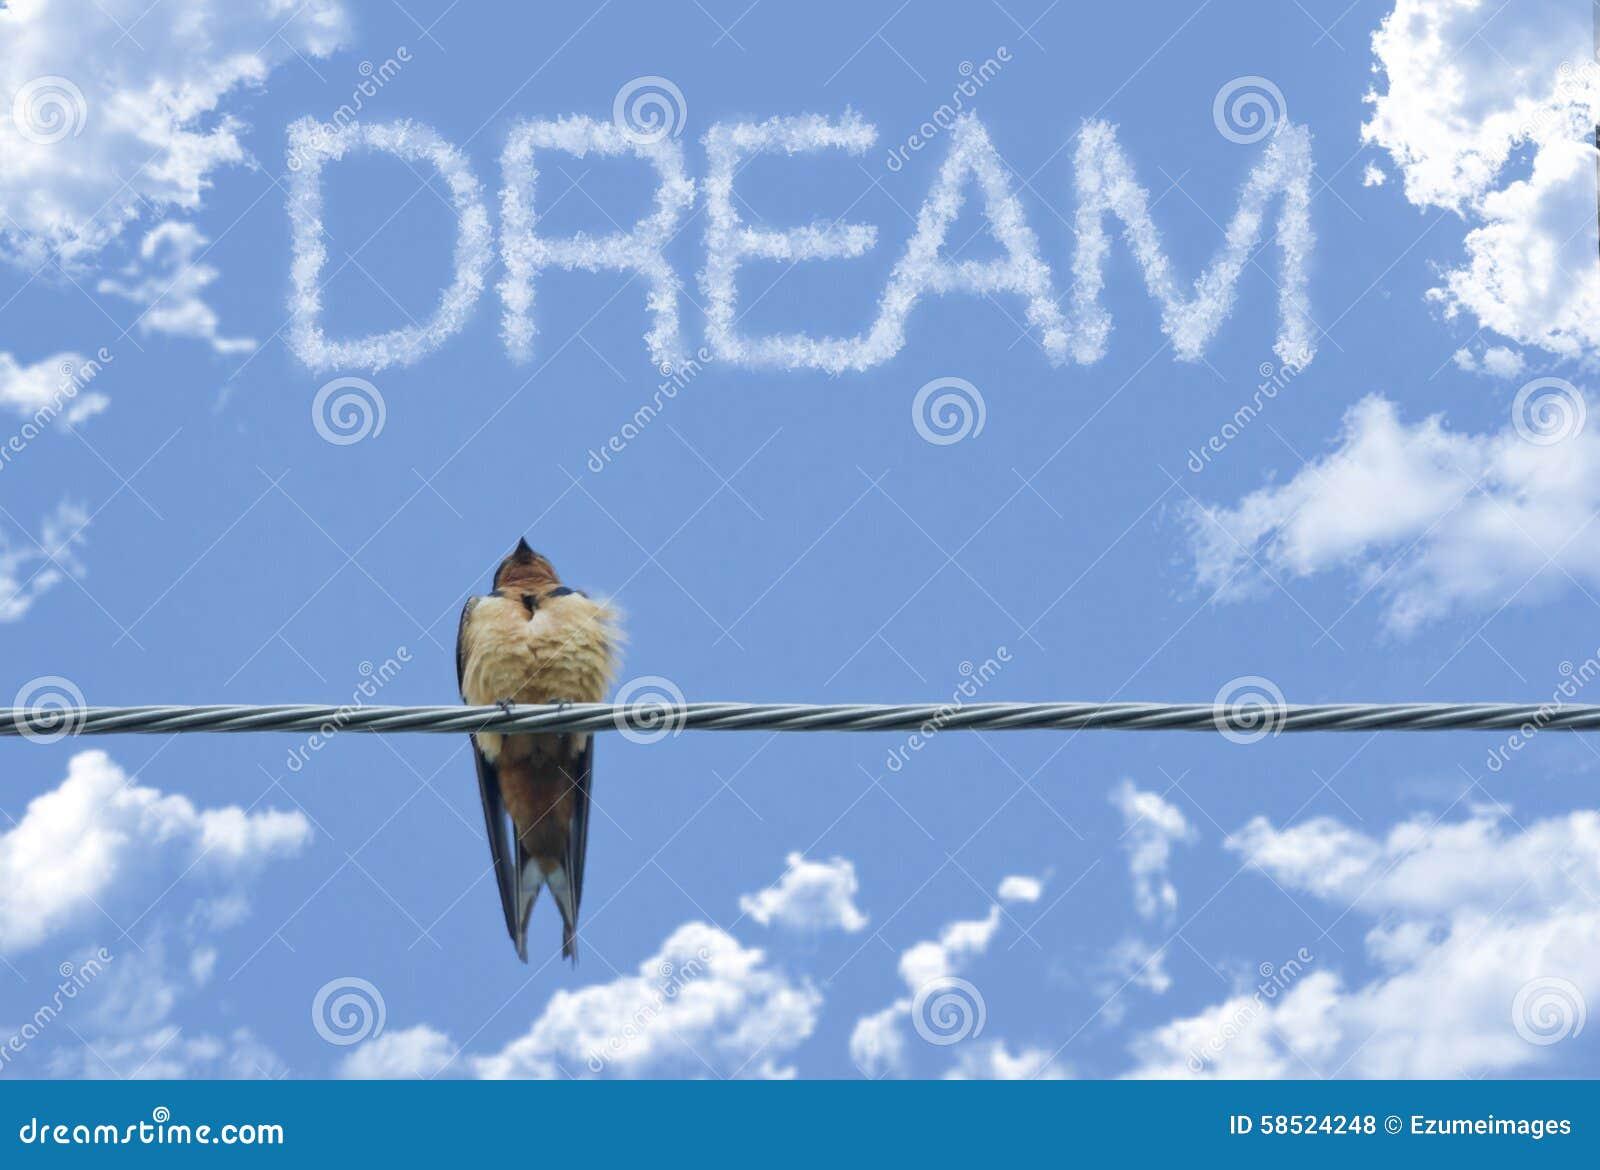 Inspiring Sparrow Dream stock photo. Image of bird, inspiring - 58524248